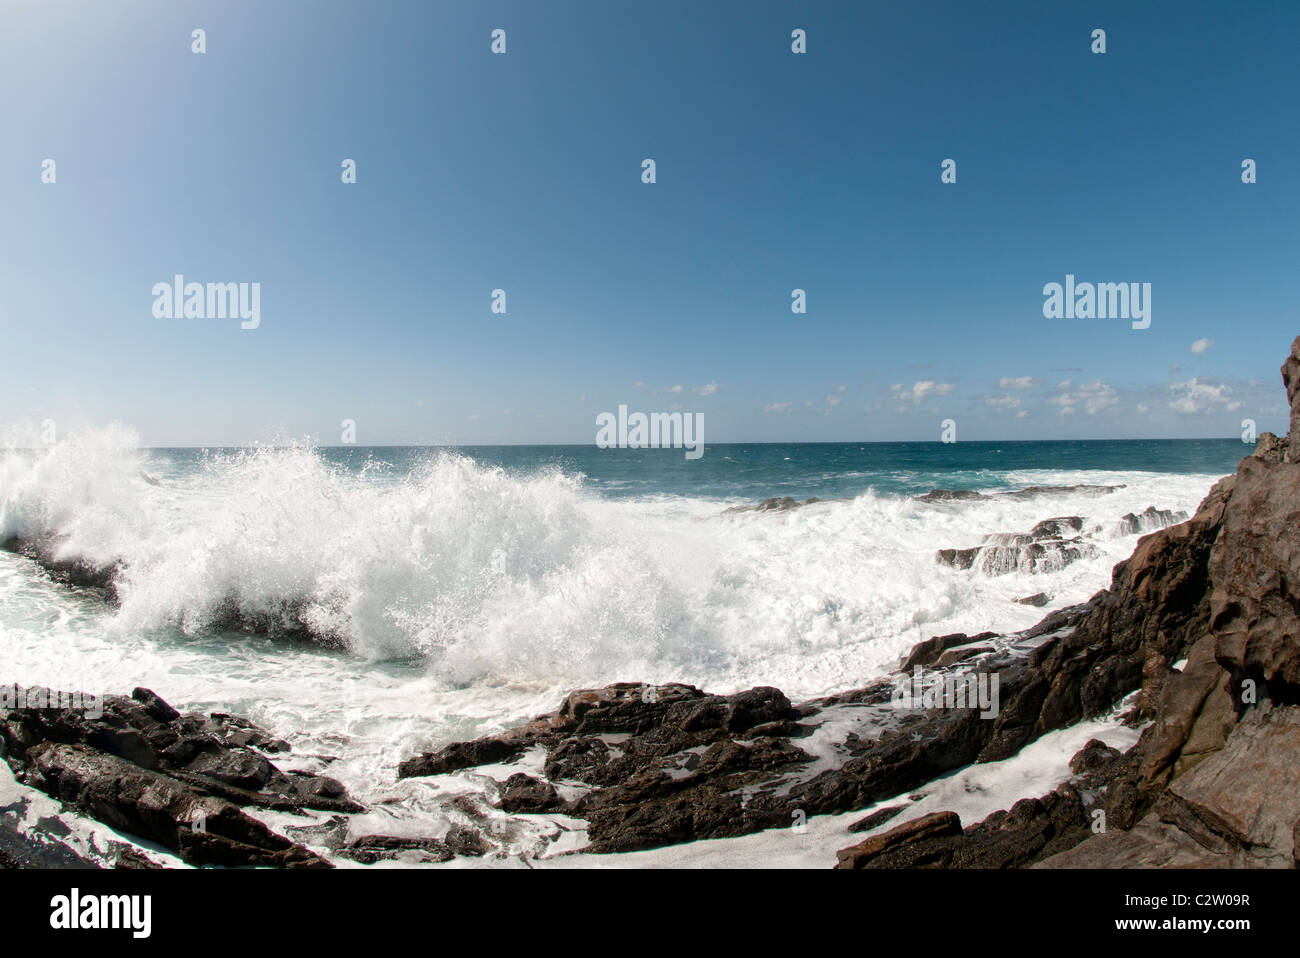 waves crashing on rocks Fuerteventura - Stock Image